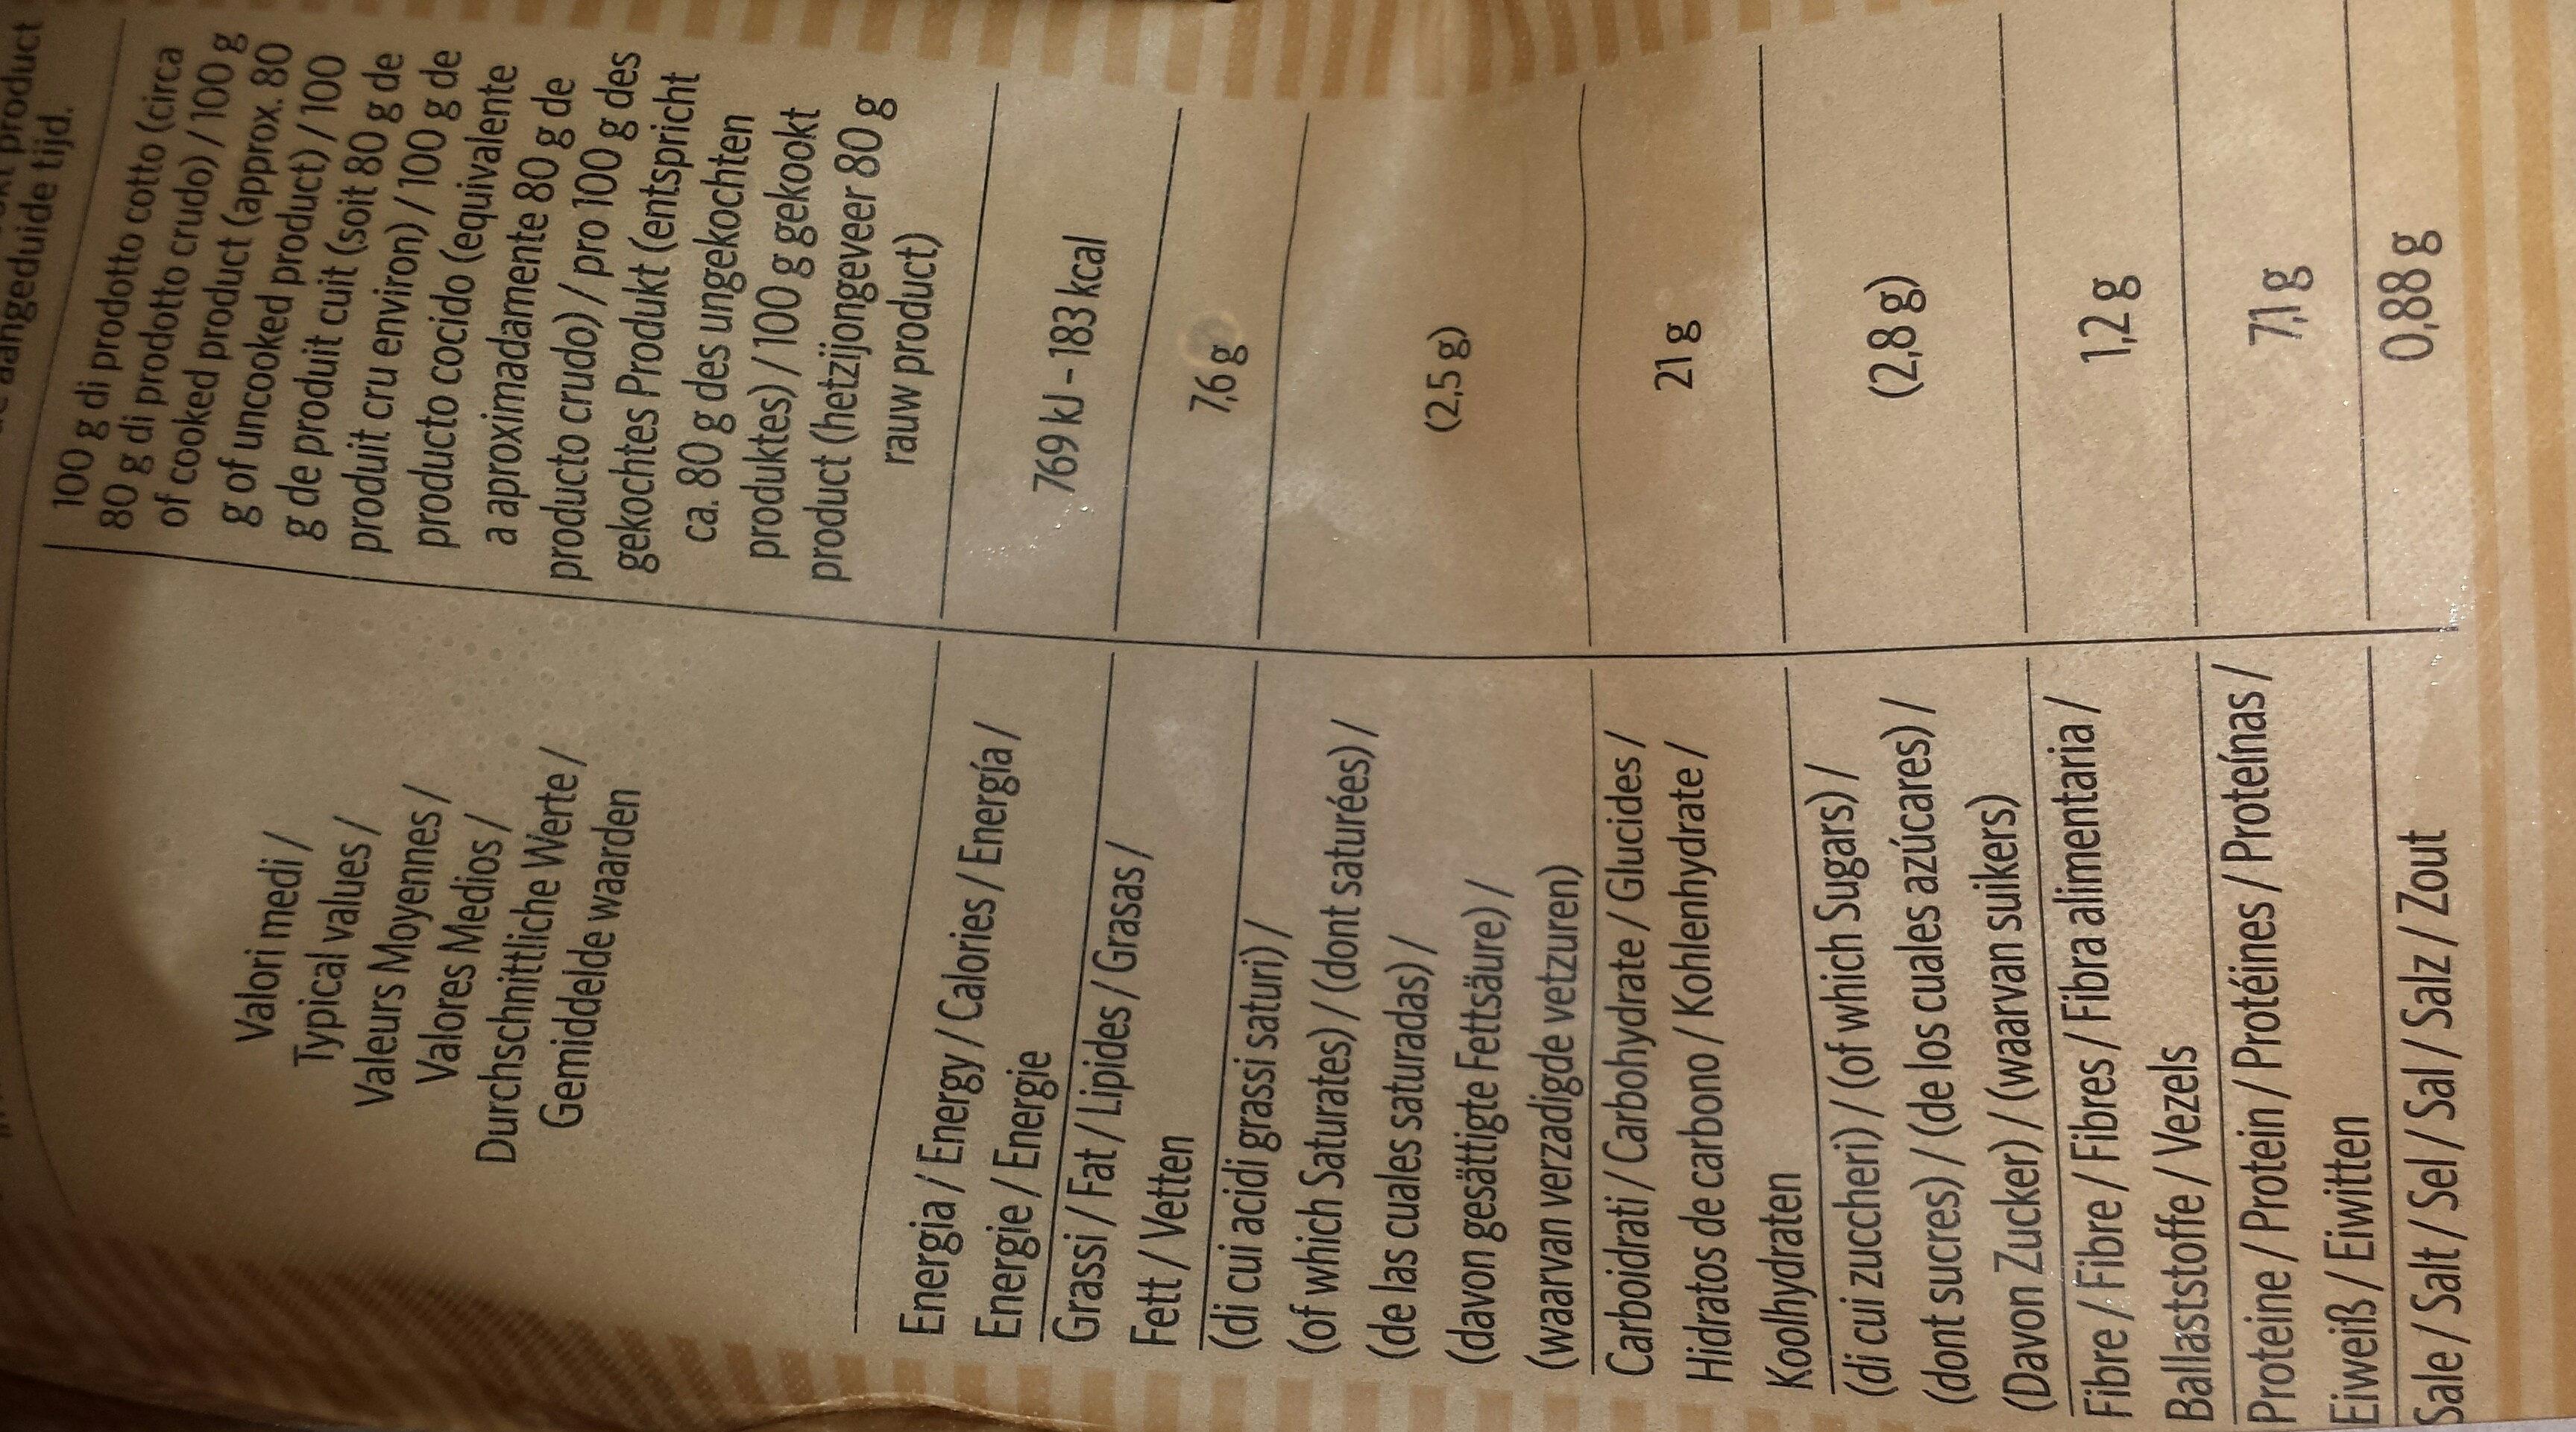 Girasoli pomodoro e mozzarella - Voedingswaarden - fr